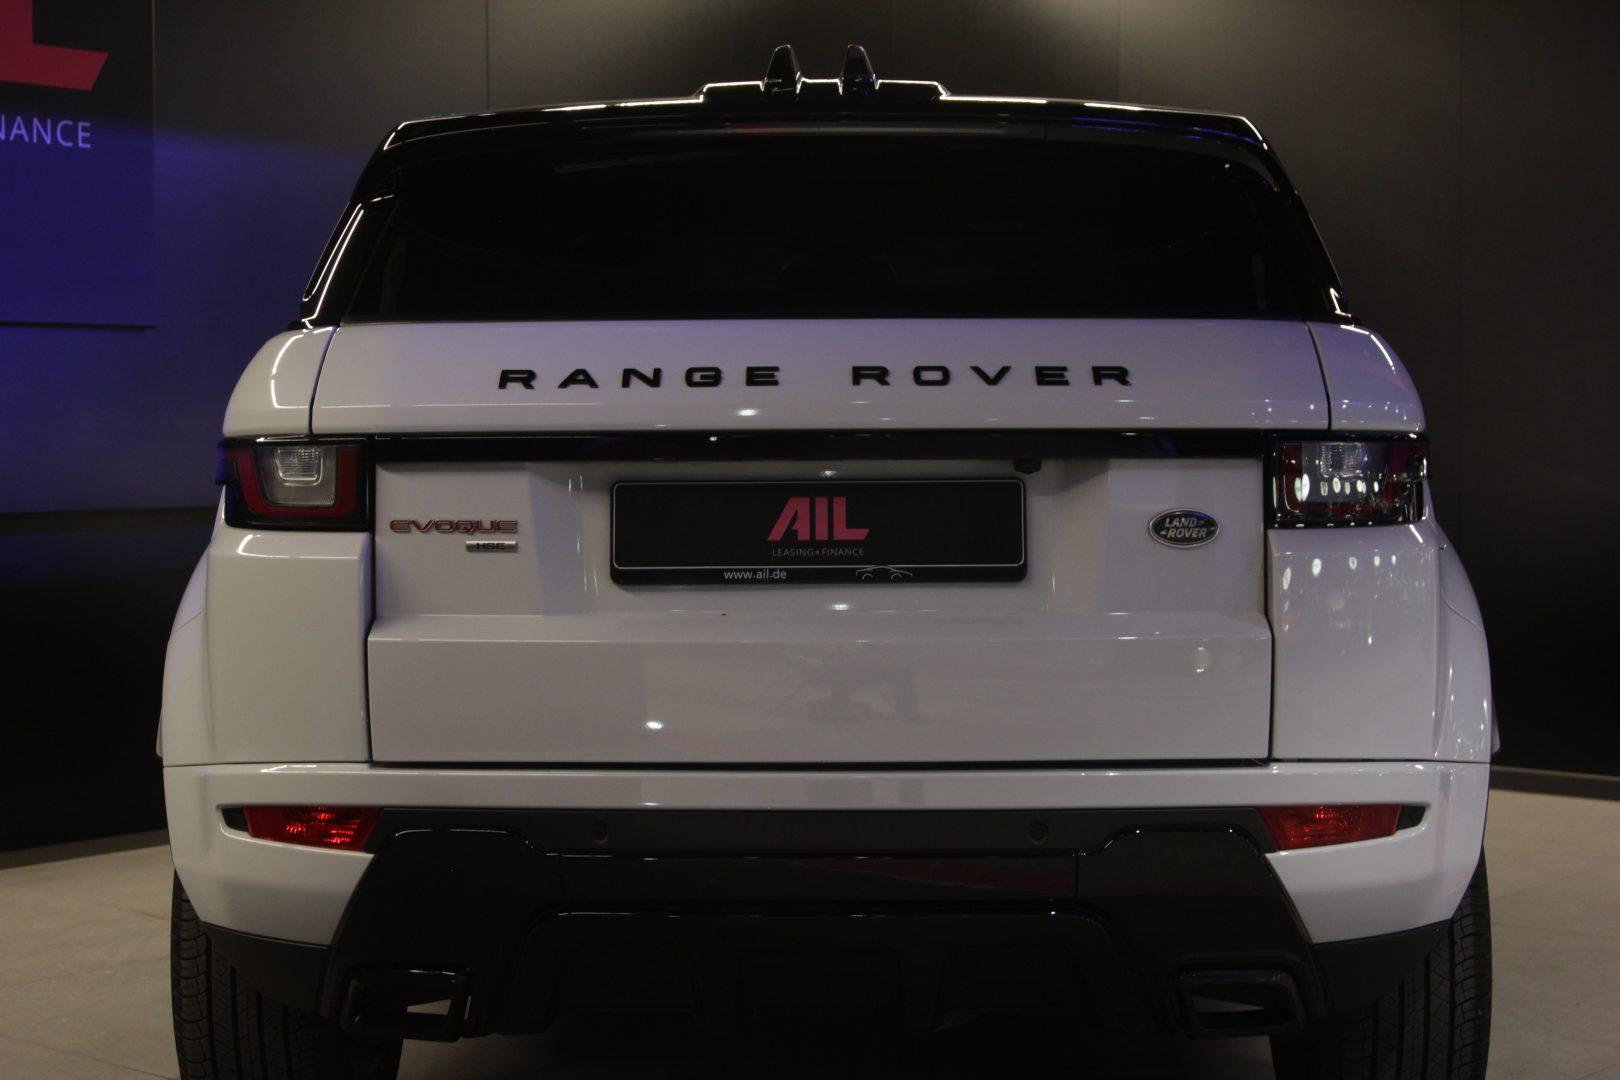 AIL Land Rover Range Rover Evoque HSE Dynamic Design-Paket  2